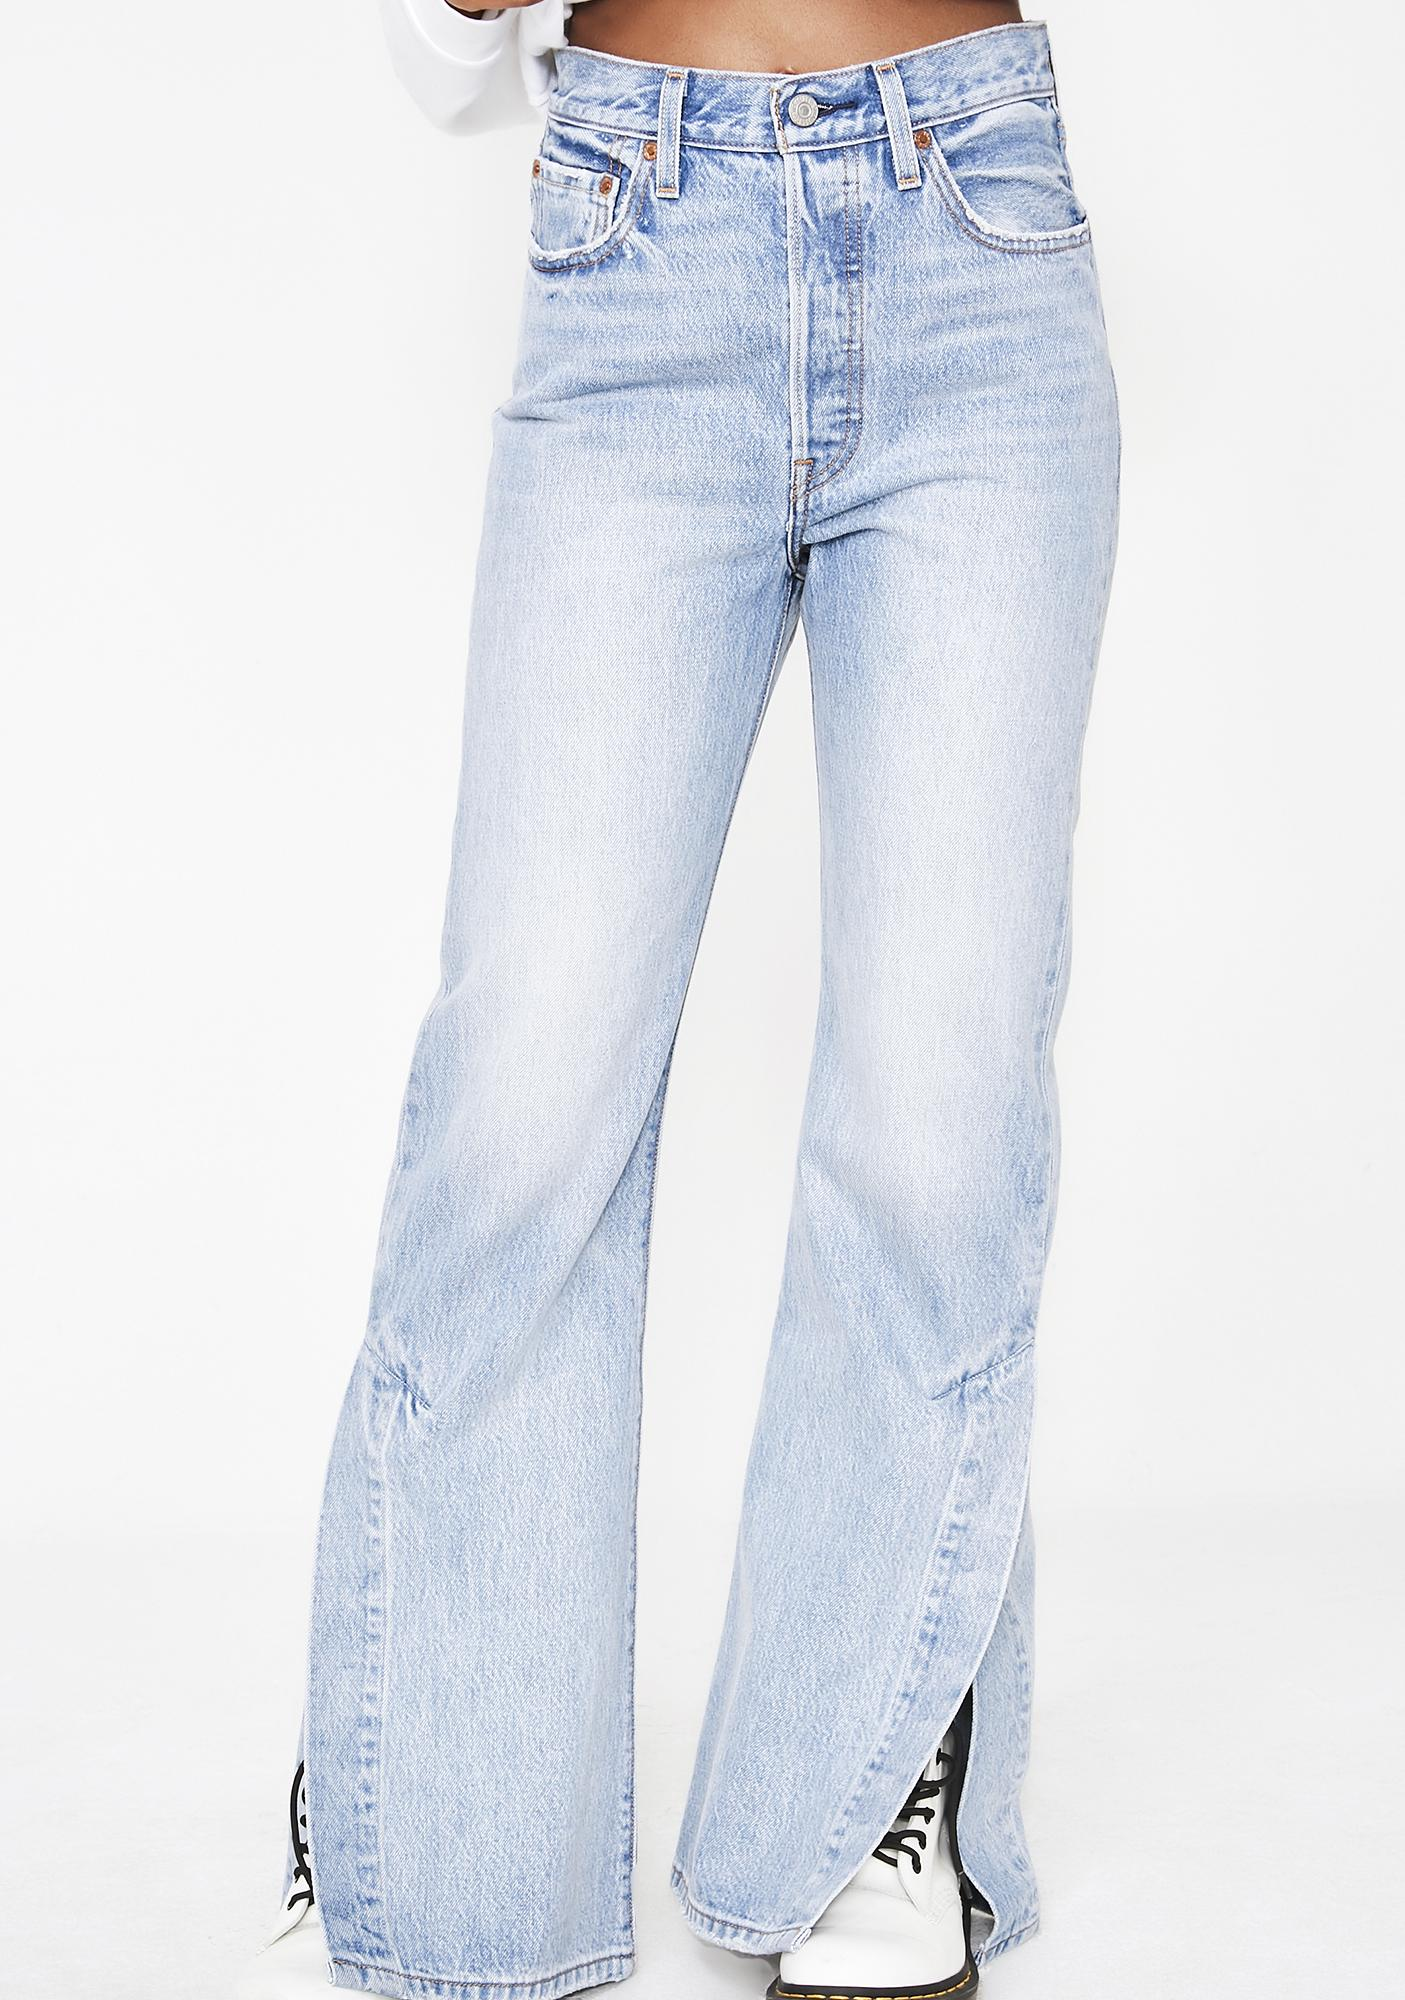 6d9d54ab1a3fe5 Levis Ribcage Split Flare Jeans | Dolls Kill